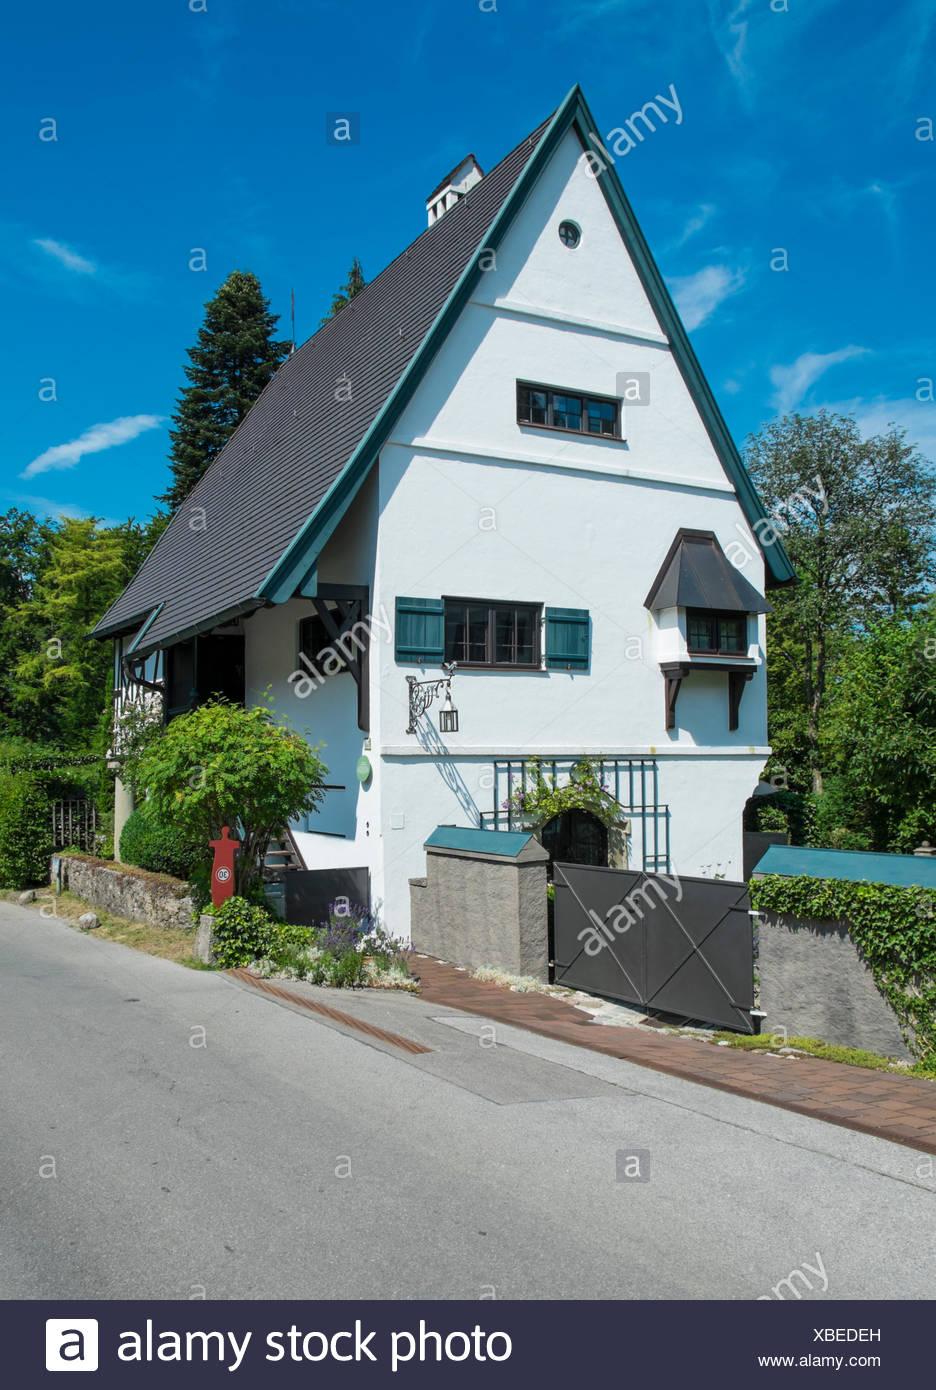 Haus mit Wassermuehle in Aschau, Chiemgau, Bayern, Germany - Stock Image